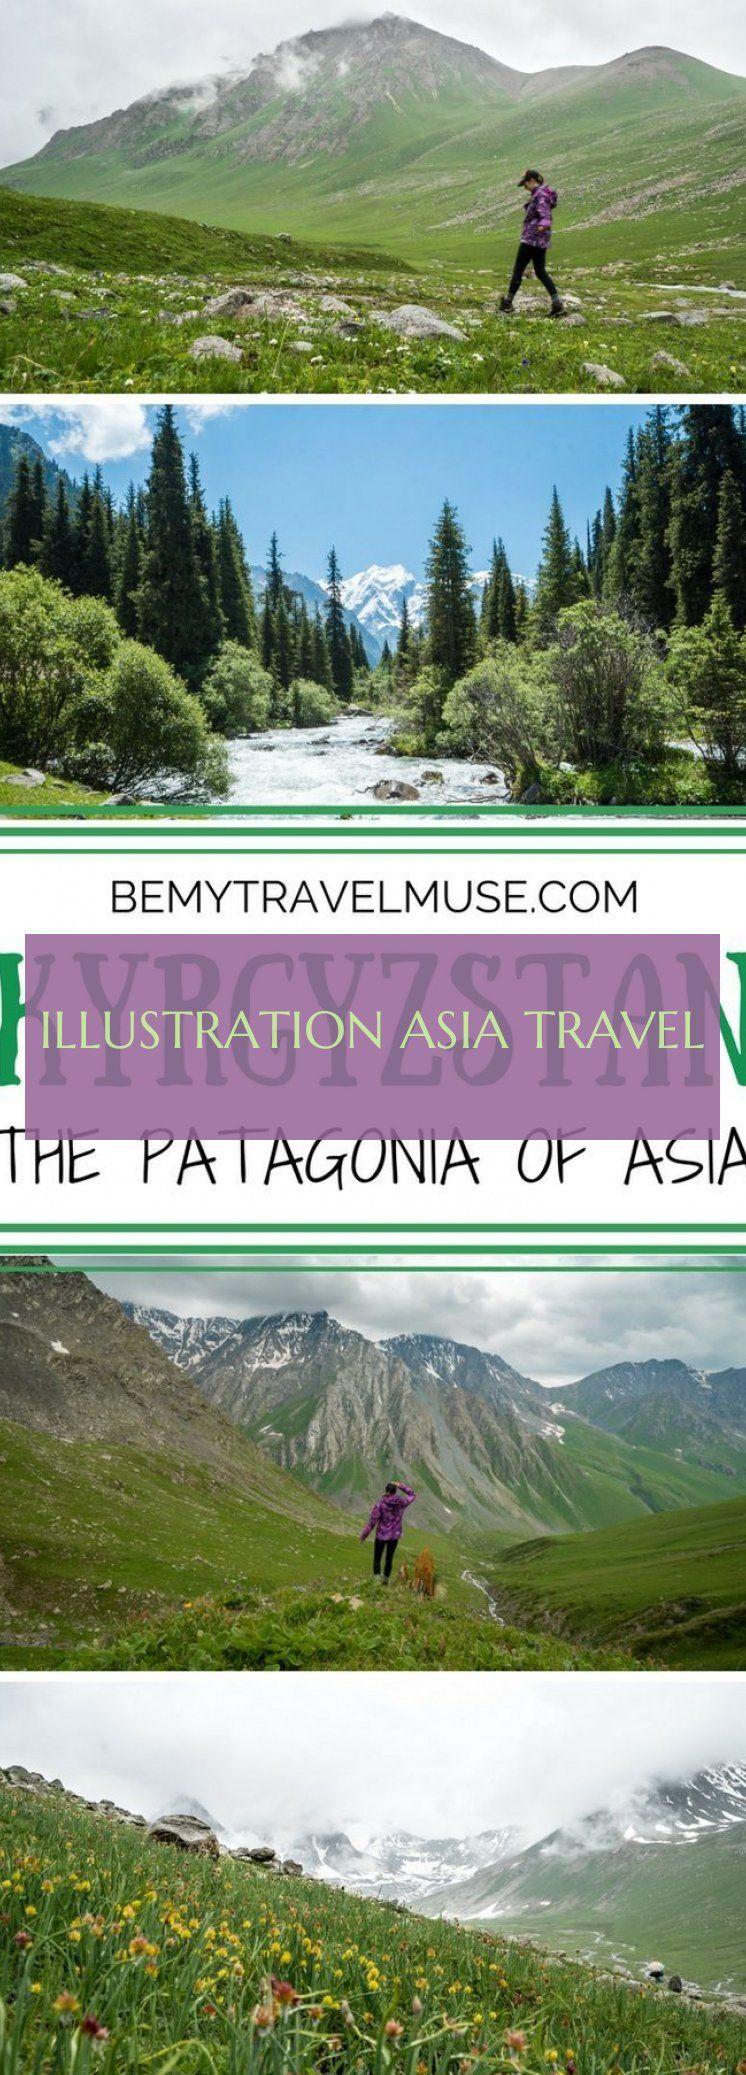 Illustration Asia Travel Illustration Asia Travel